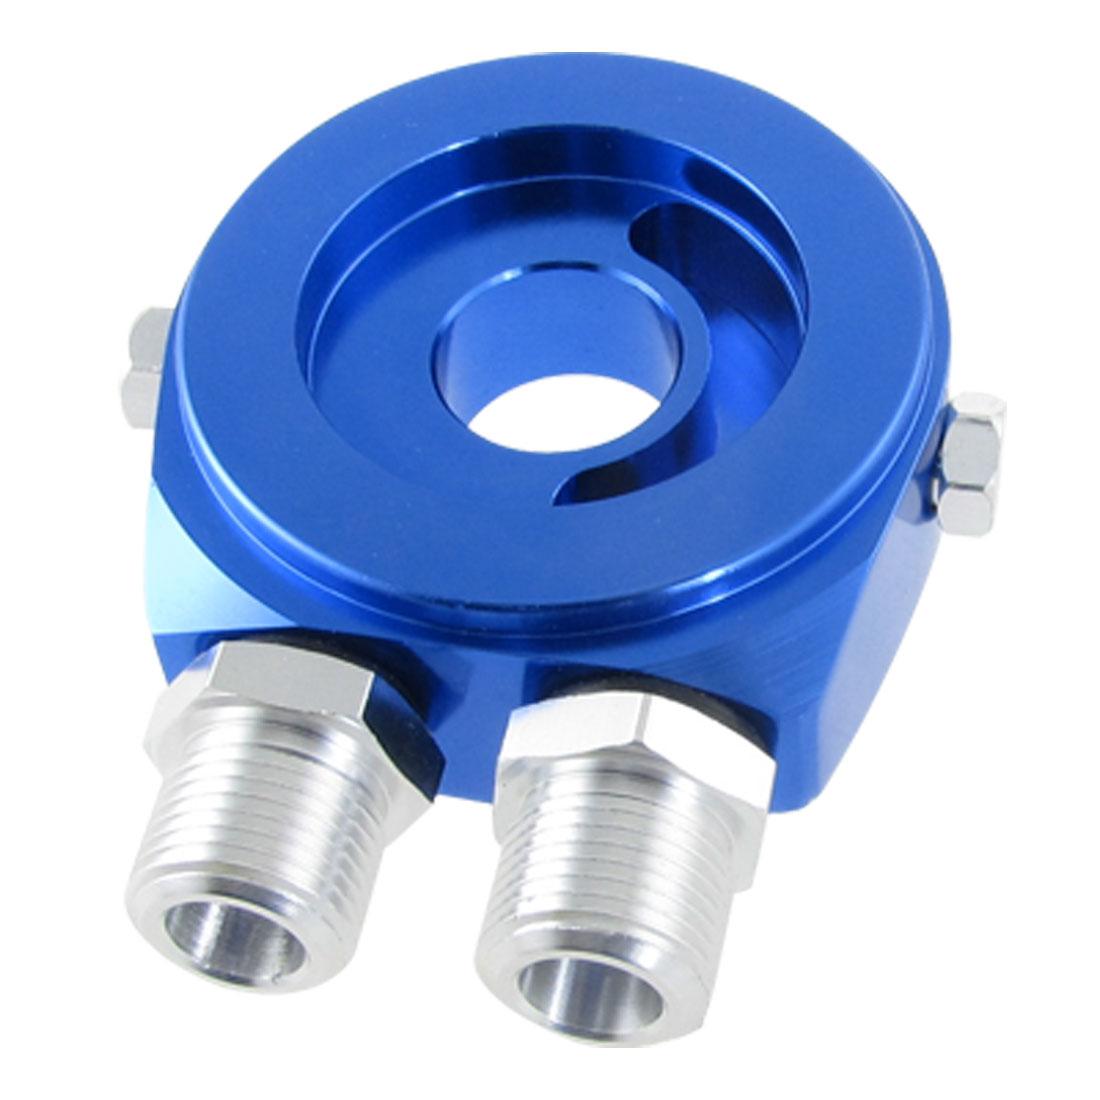 Metal Oil Filter Sandwich Adapters Cooler Plate Blue